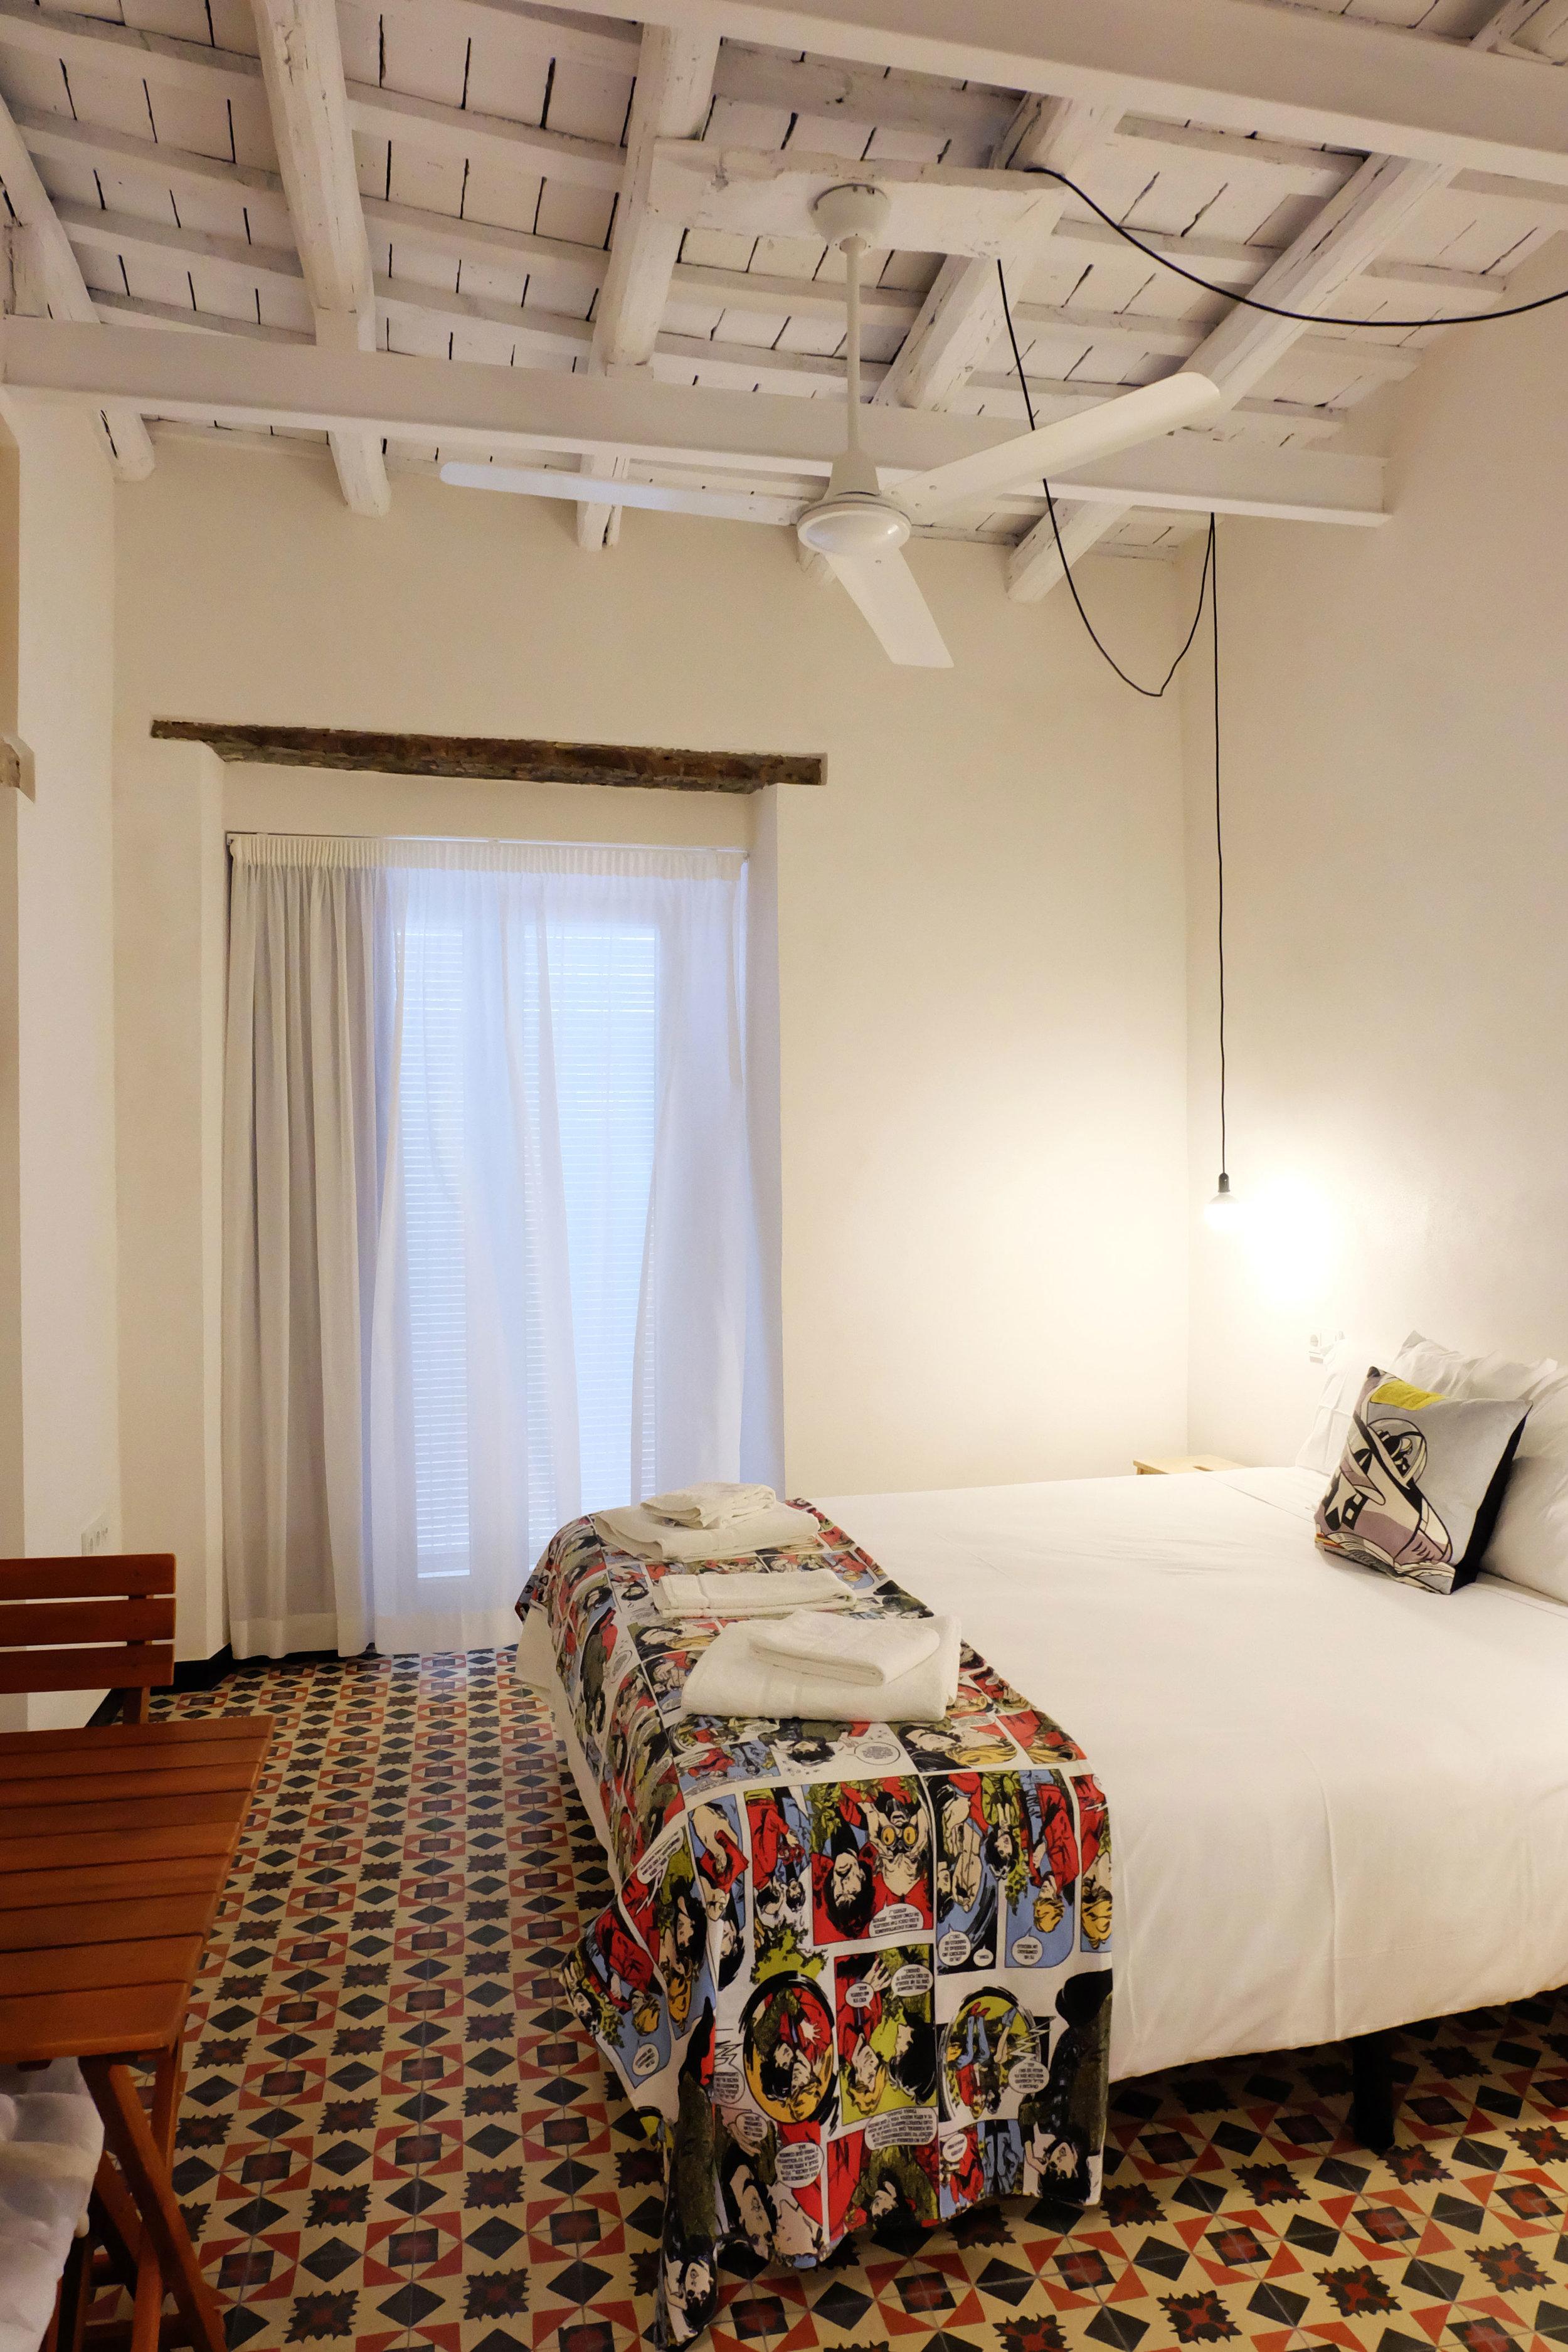 Hotel-Casa-de-Huespedes-Santa-Maria-Habitacion-1-5.jpg